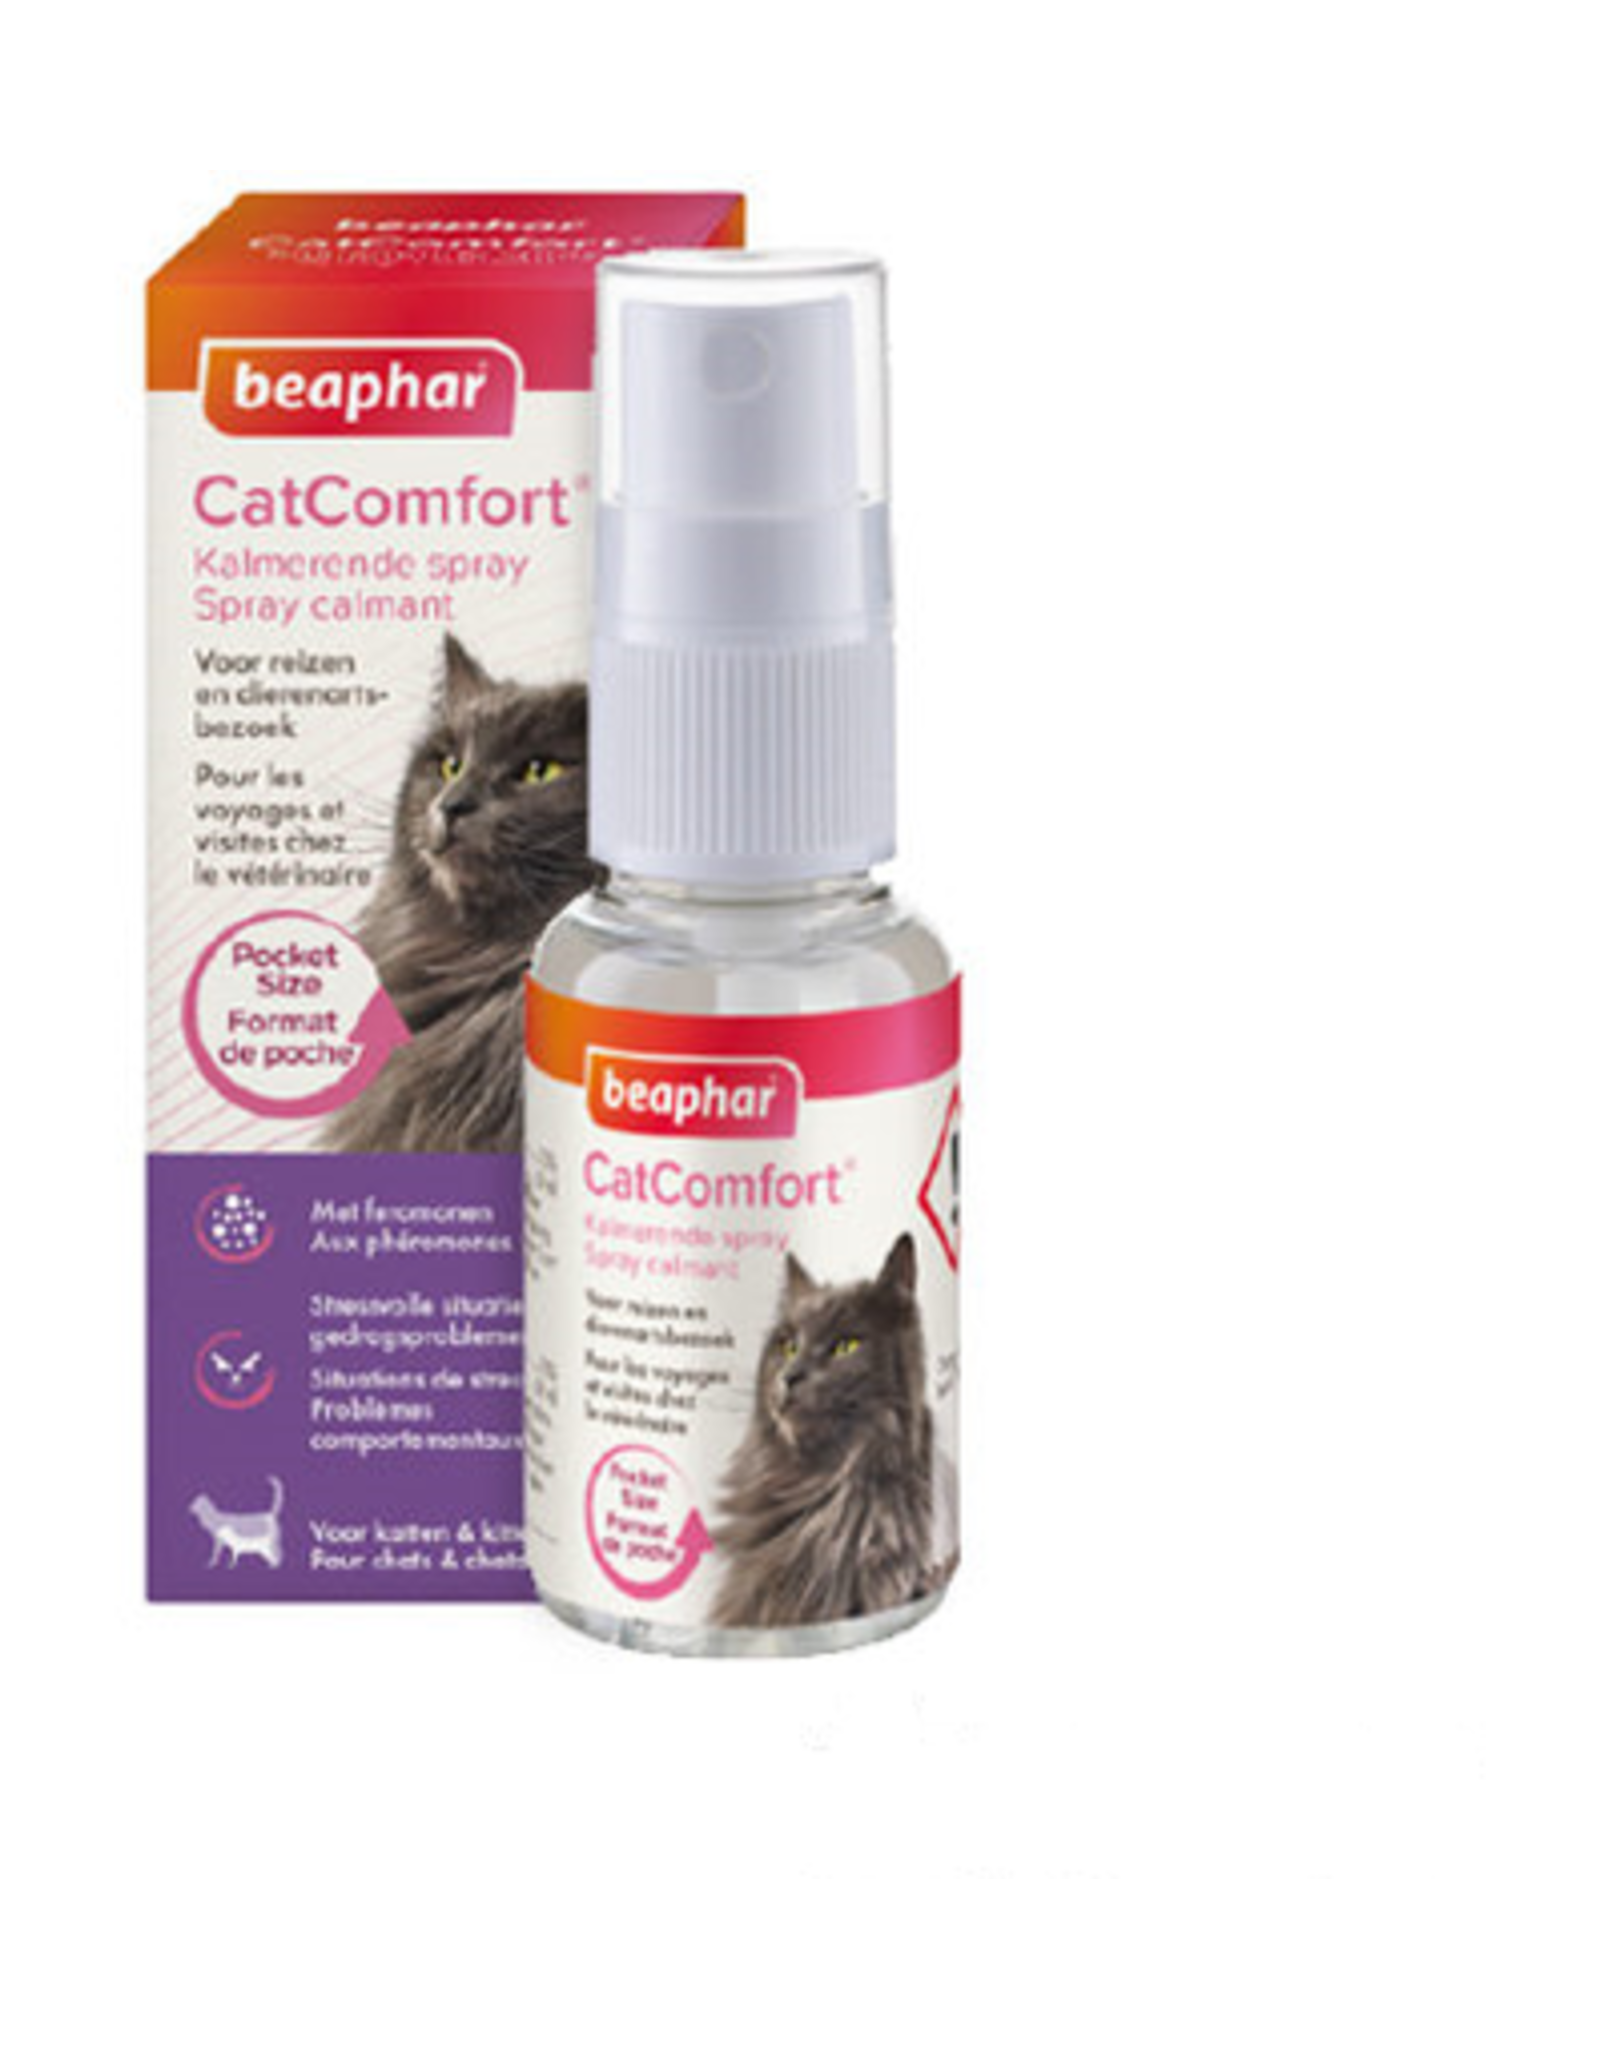 Beaphar catcomfort spray 60ml